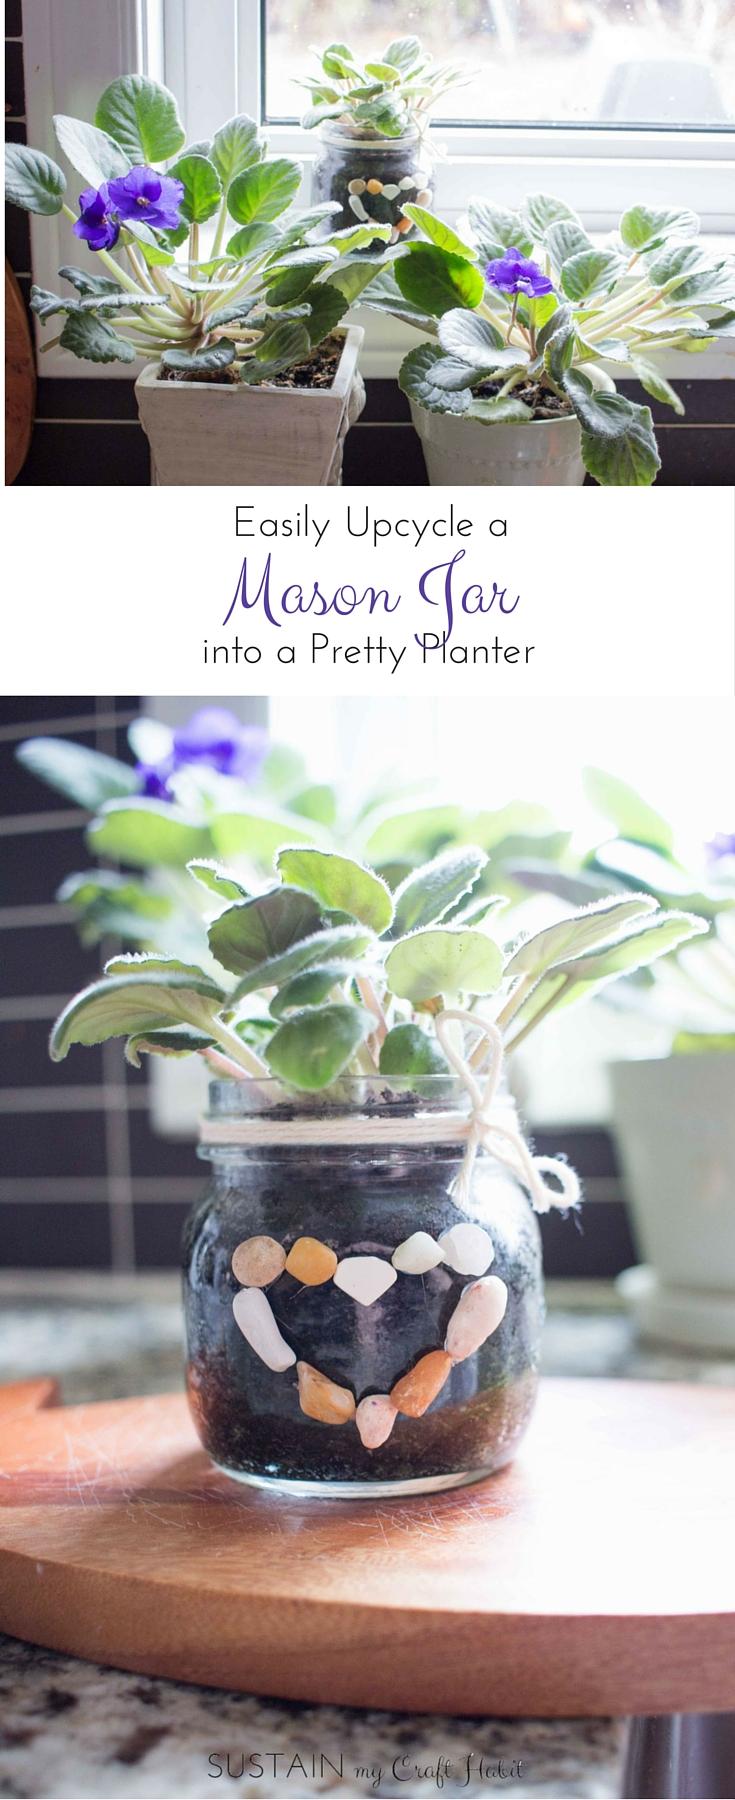 African violets growing healthy in a DIY mason jar planter on a window sill